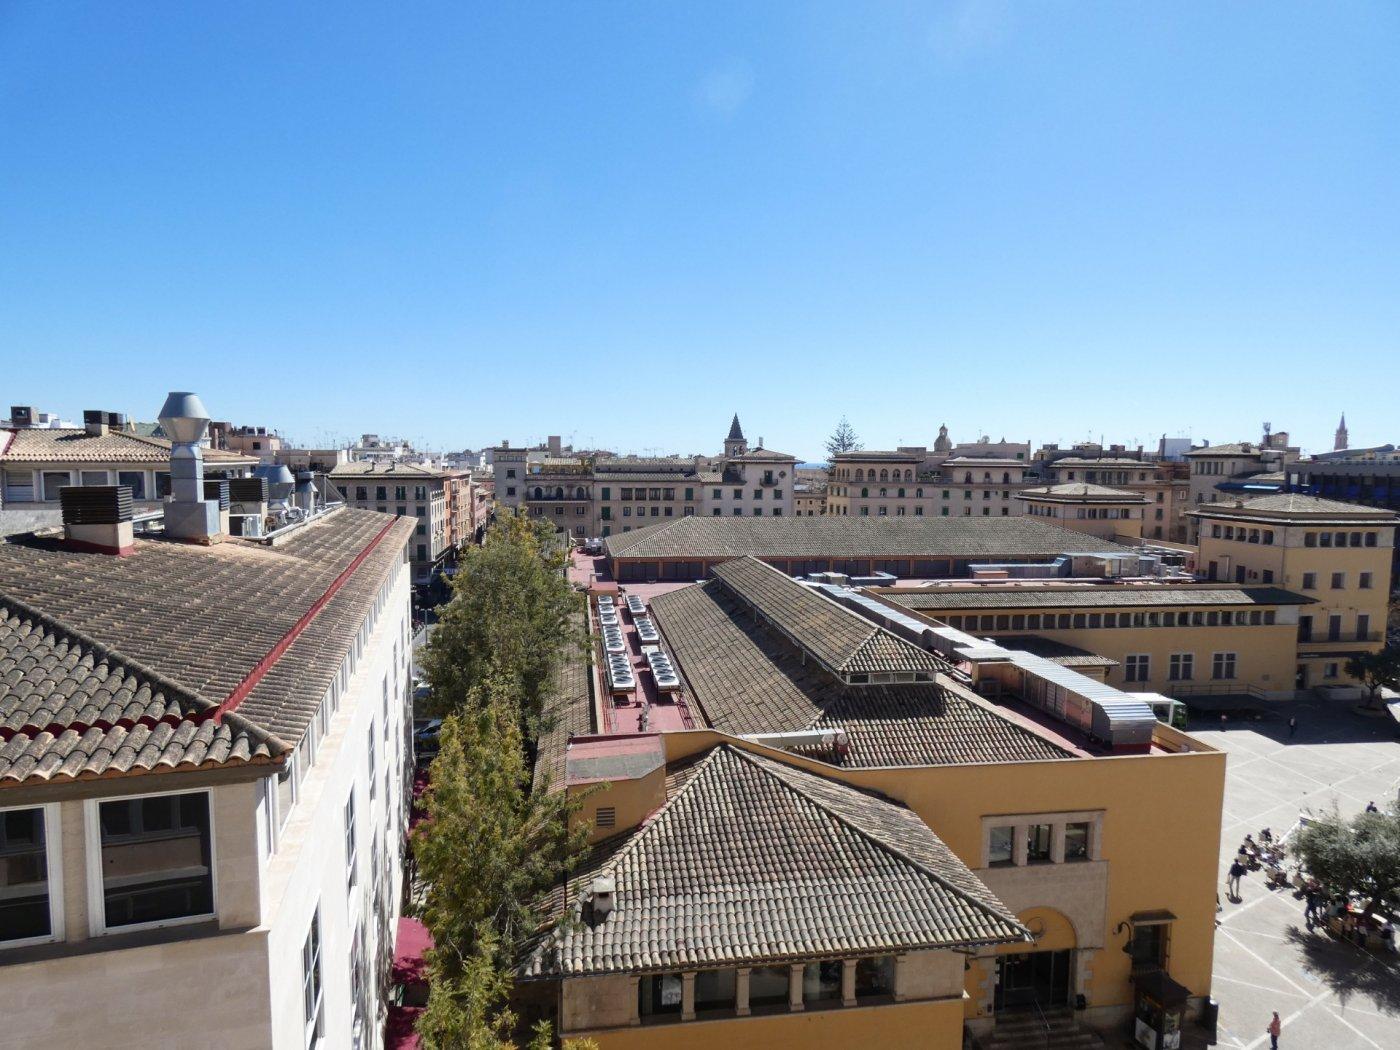 Despacho-Venta-Palma de Mallorca-185572-Foto-26